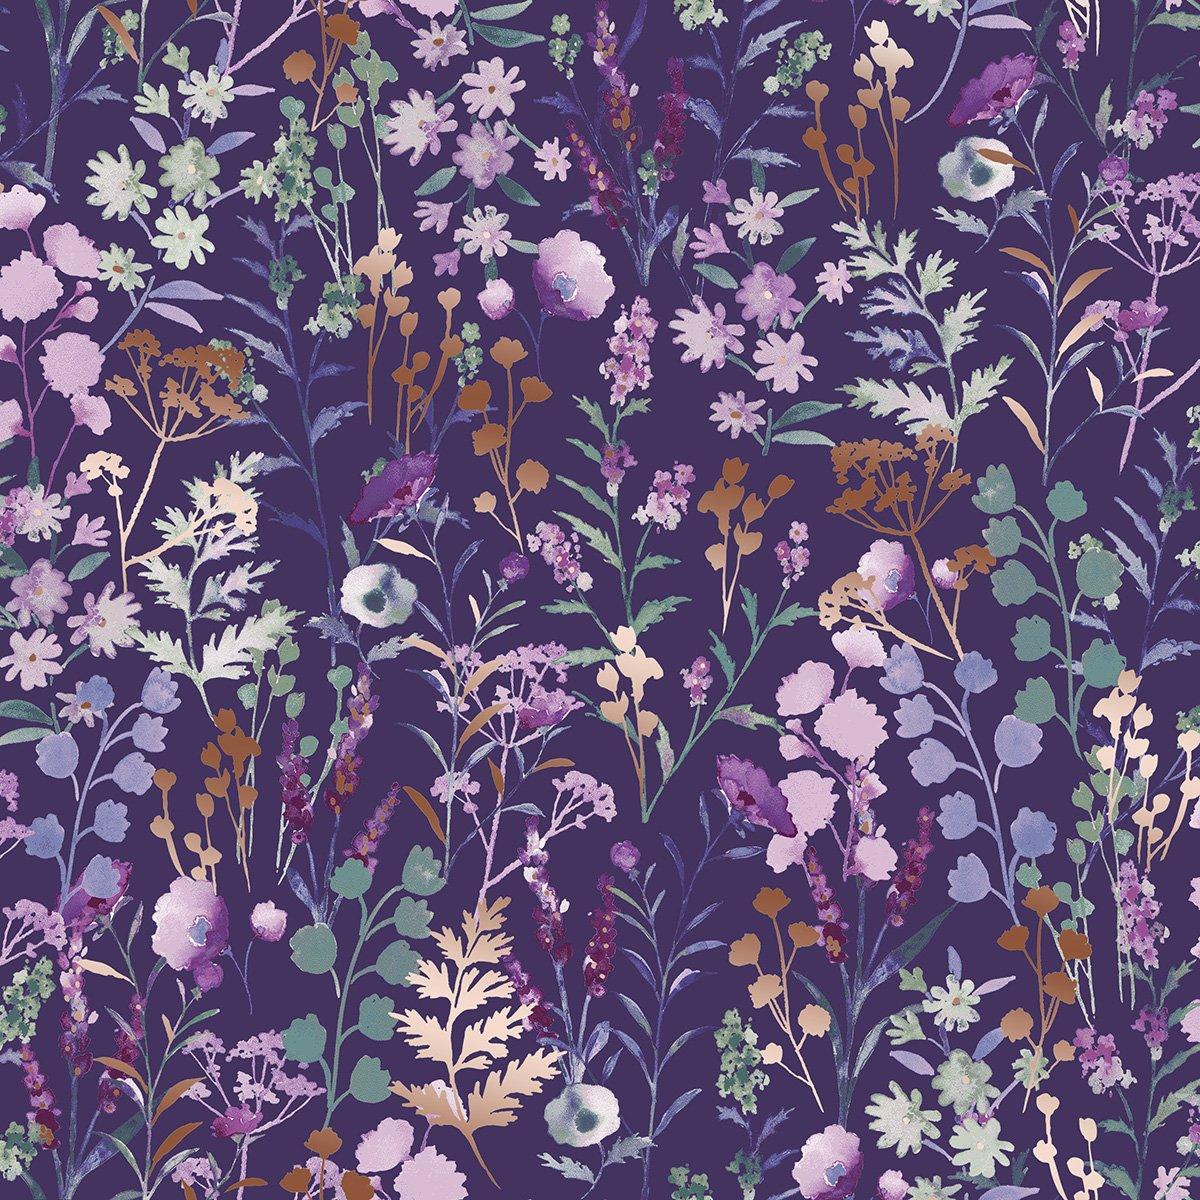 Lilac & Sage - Wildflowers - Purple